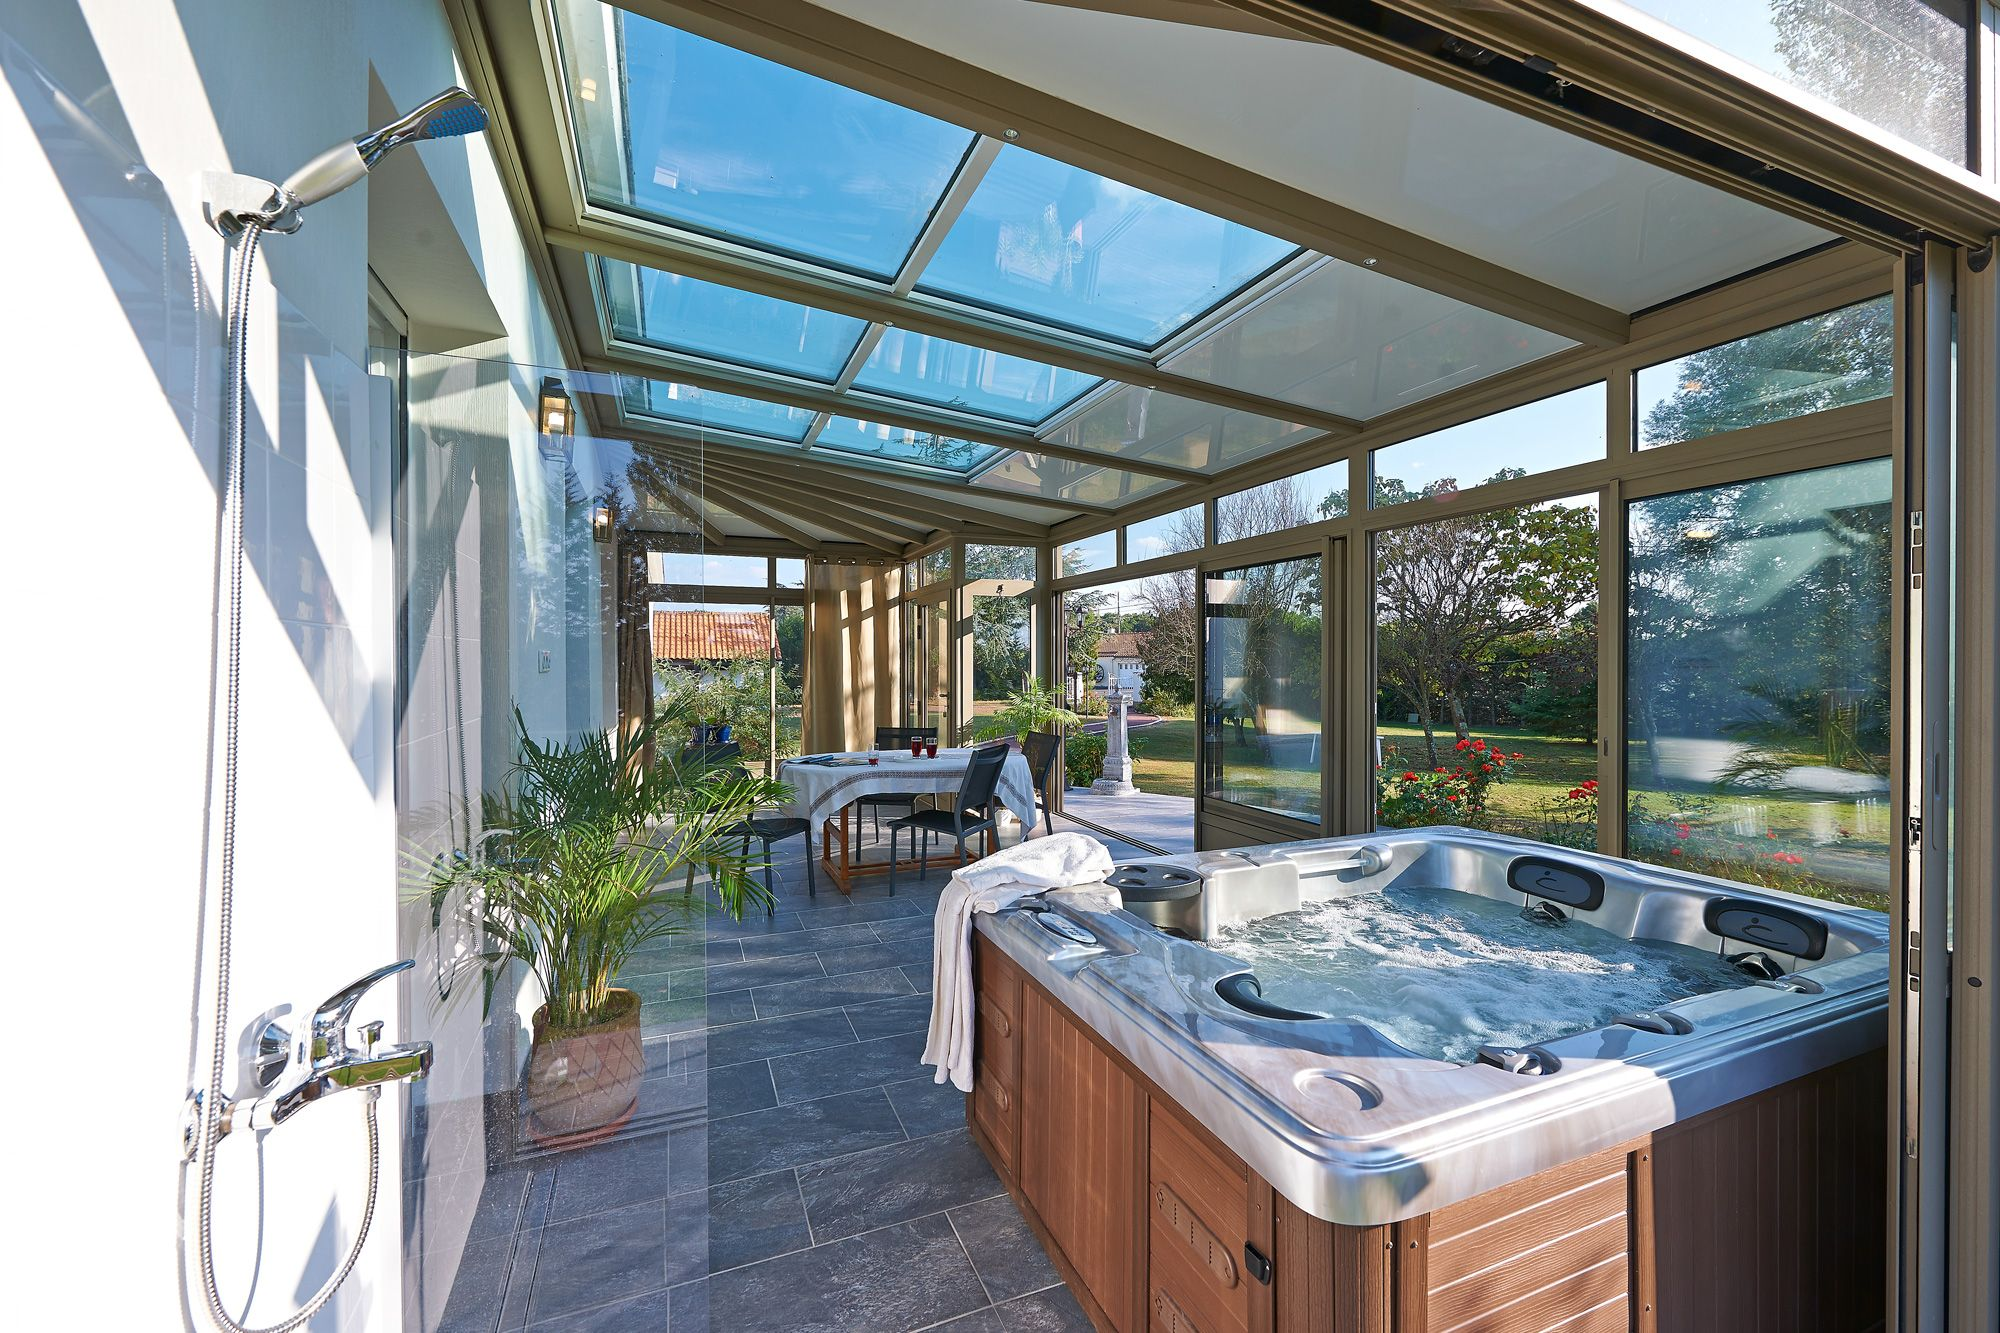 Une Veranda Avec Spa Veranda Bioclimatique Amenagement Veranda Idees Veranda